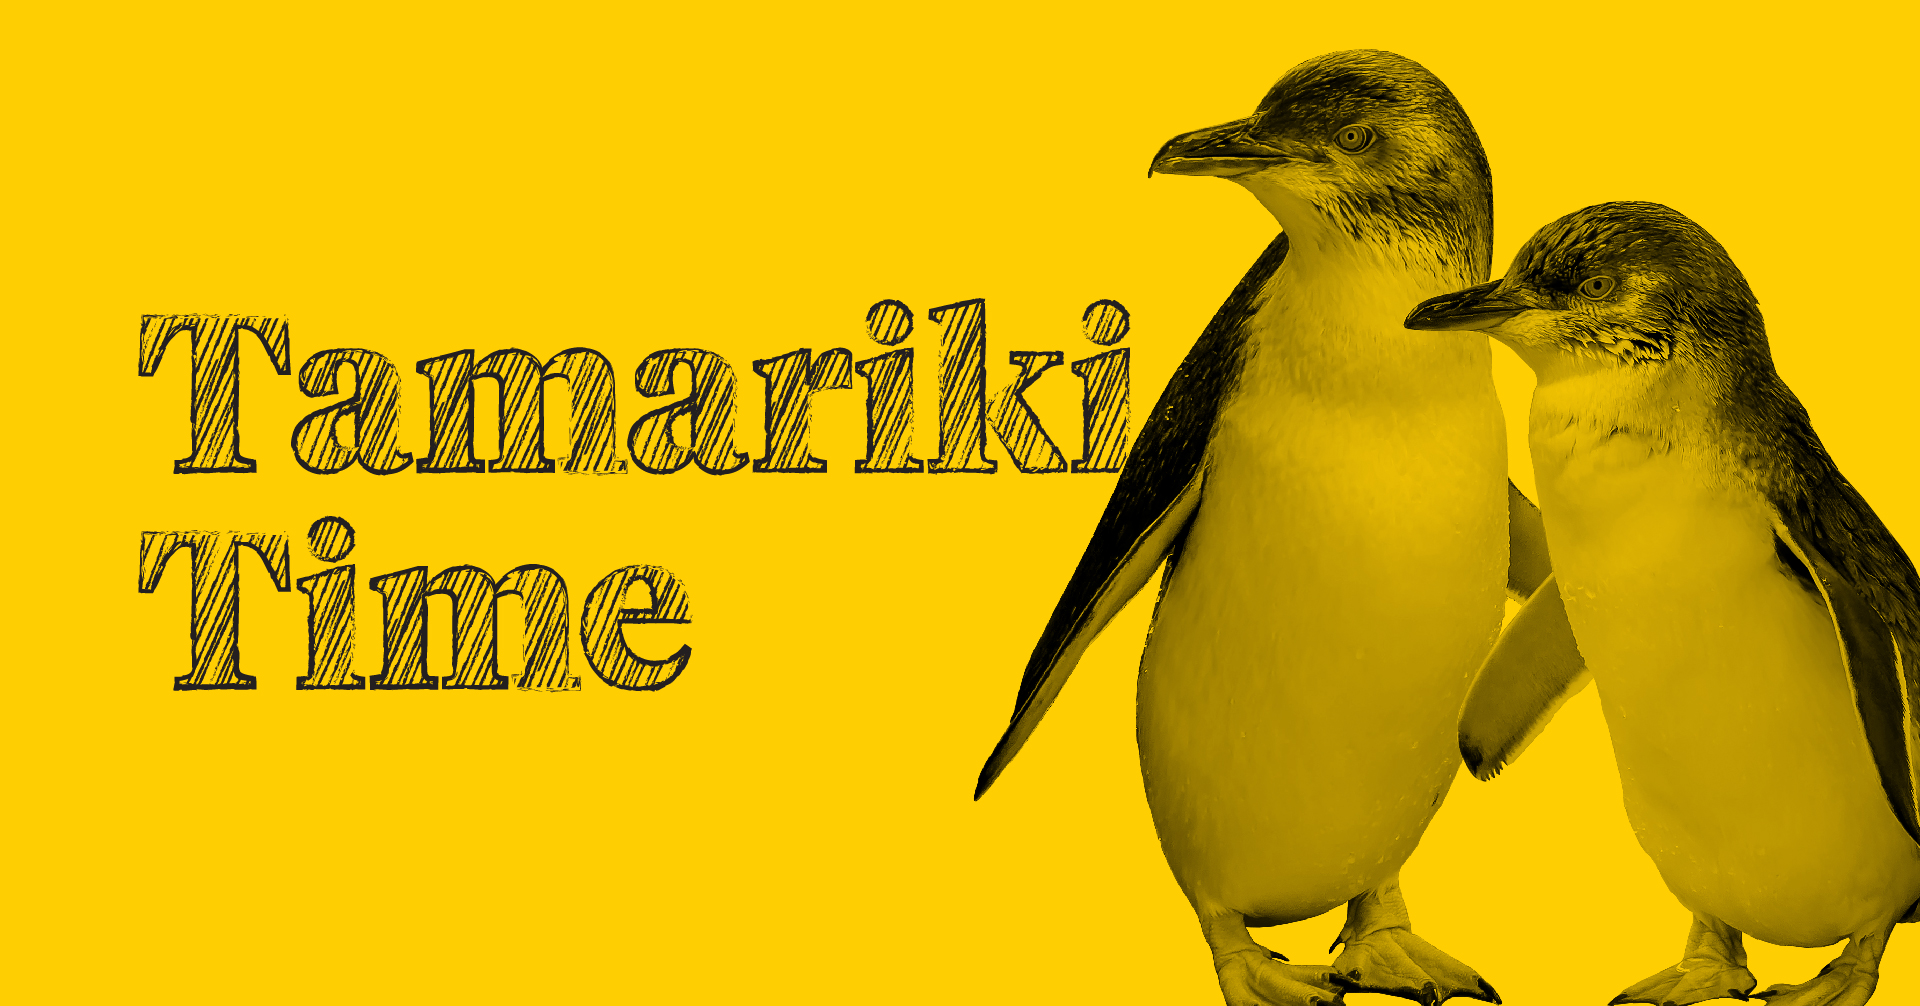 https://rfacdn.nz/zoo/assets/media/tamariki-time-gallery.jpg